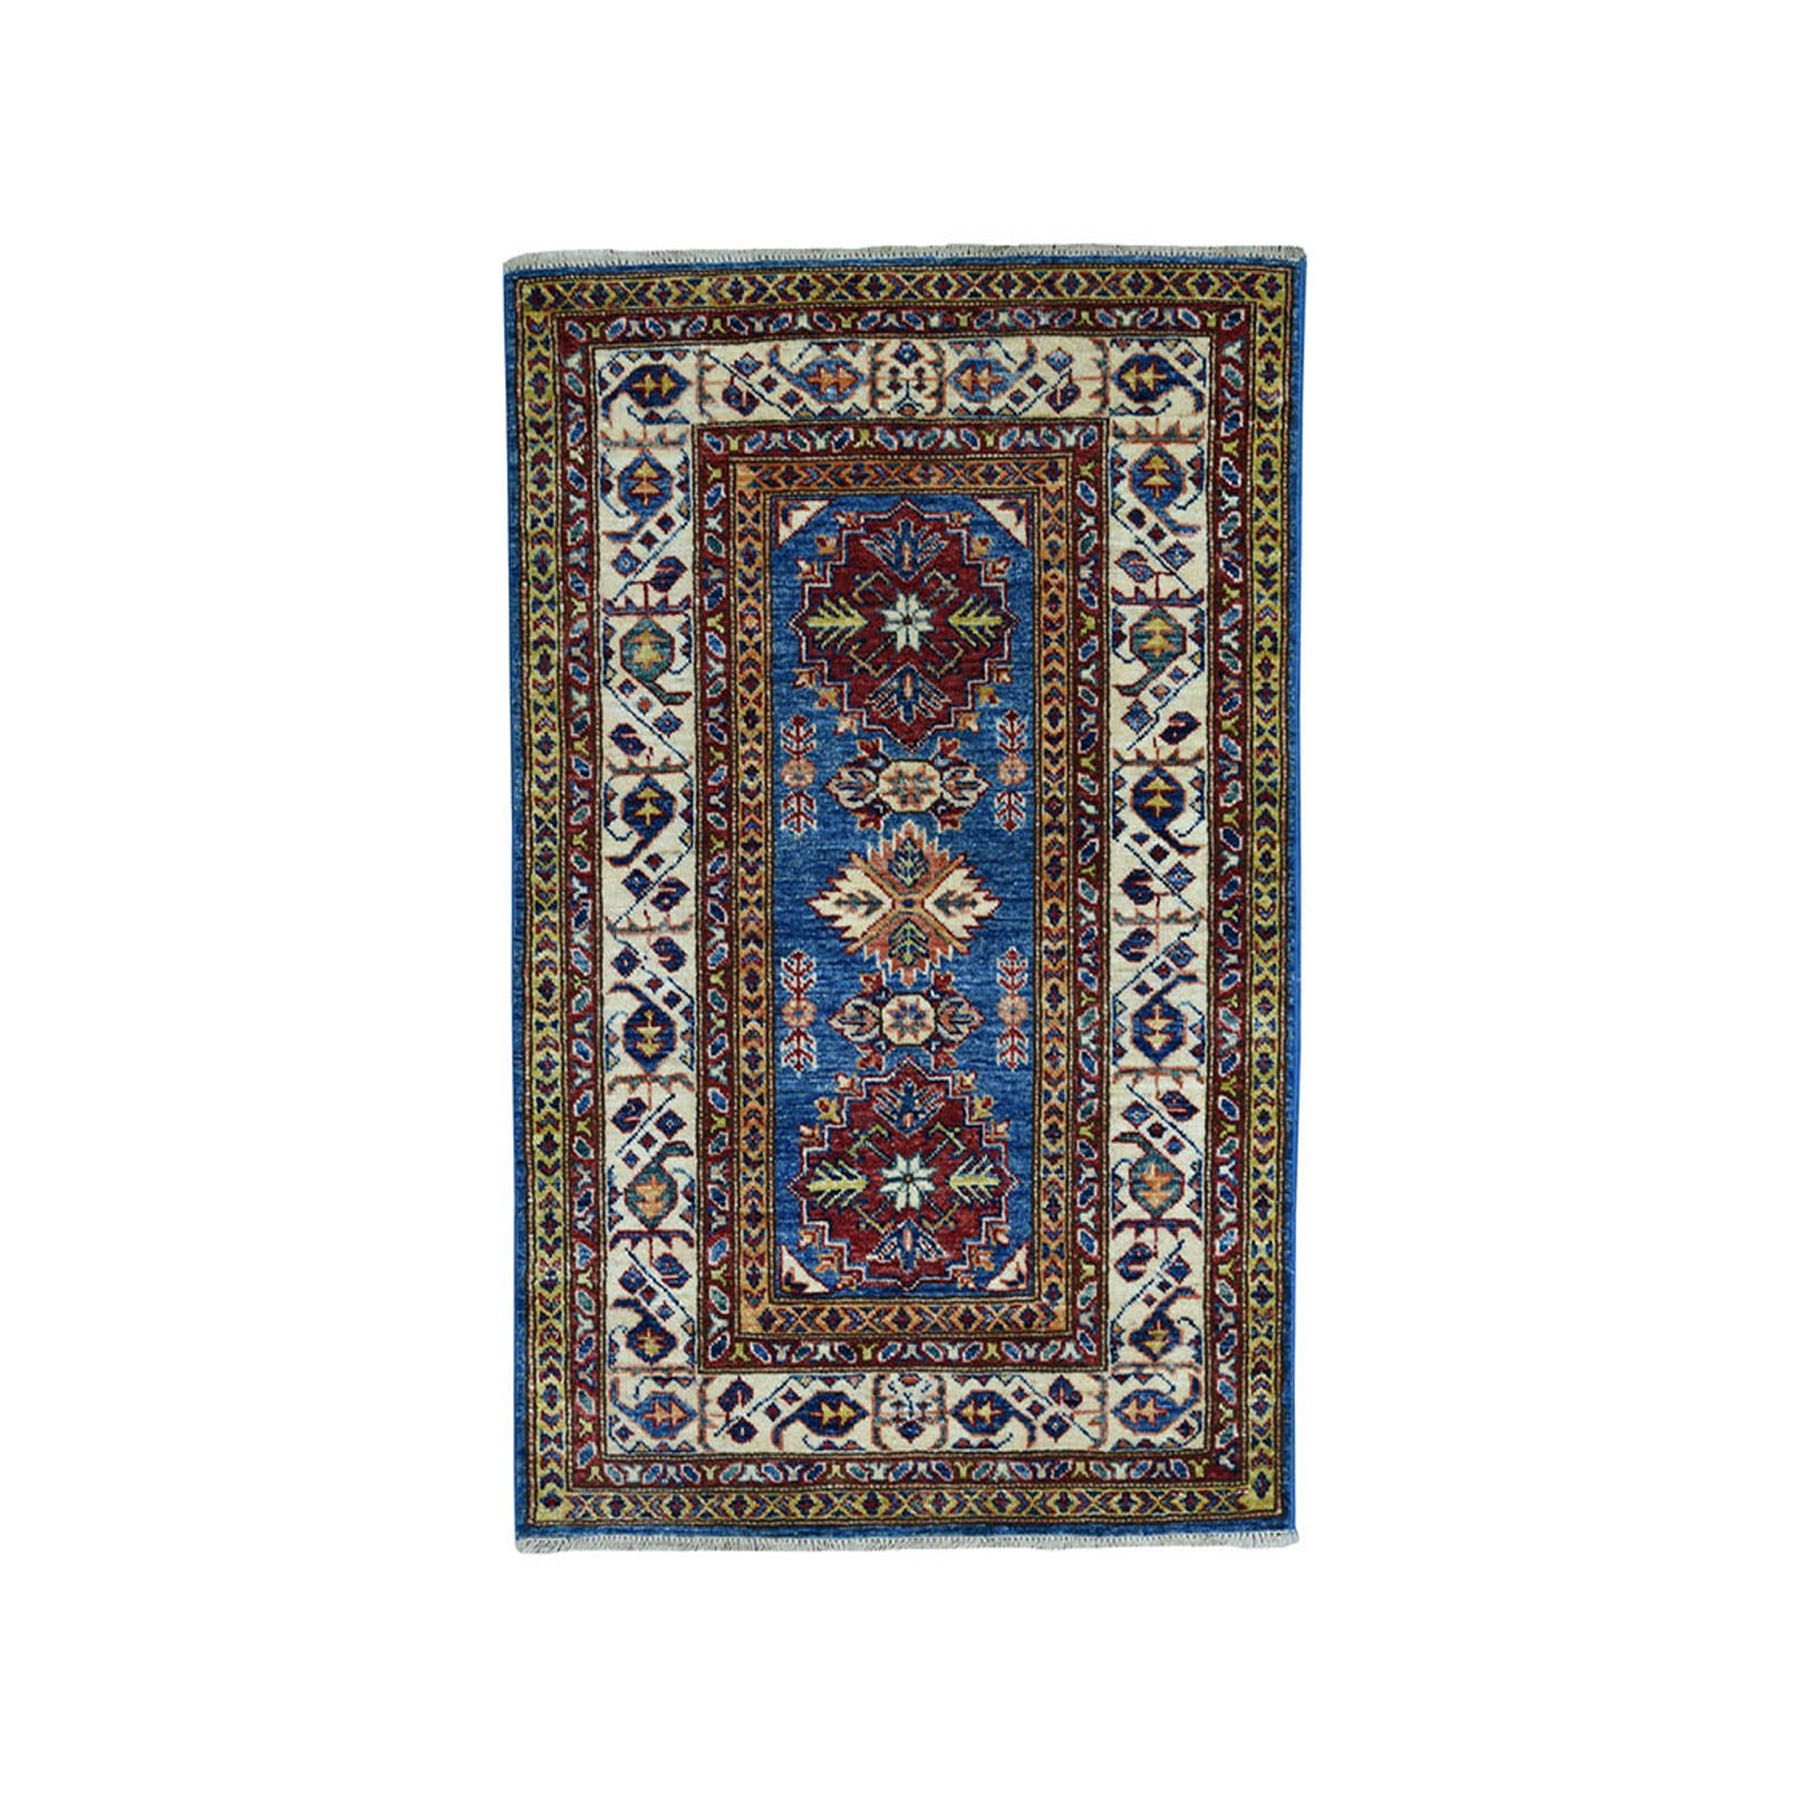 "2'8""X4' Blue Super Kazak Pure Wool Geometric Design Hand-Knotted Oriental Rug moae089b"